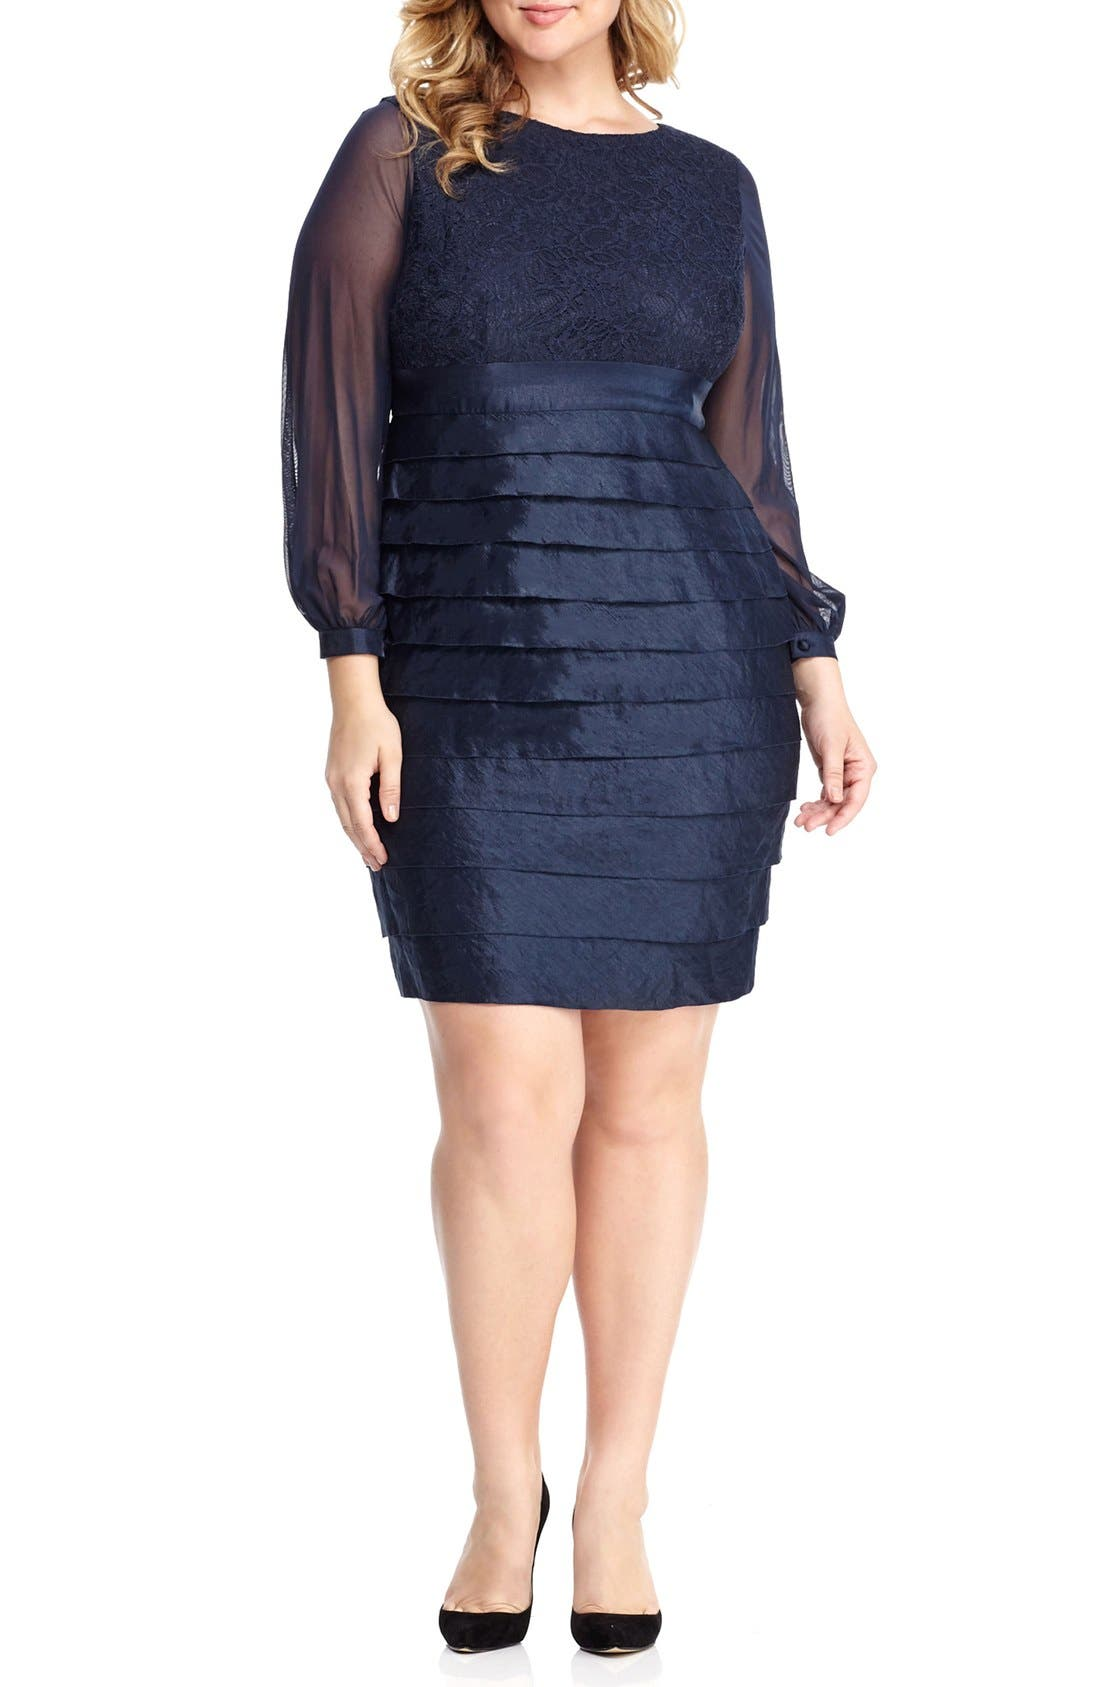 Alternate Image 1 Selected - London Times Pleat Lace & Taffeta Sheath Dress (Plus Size)